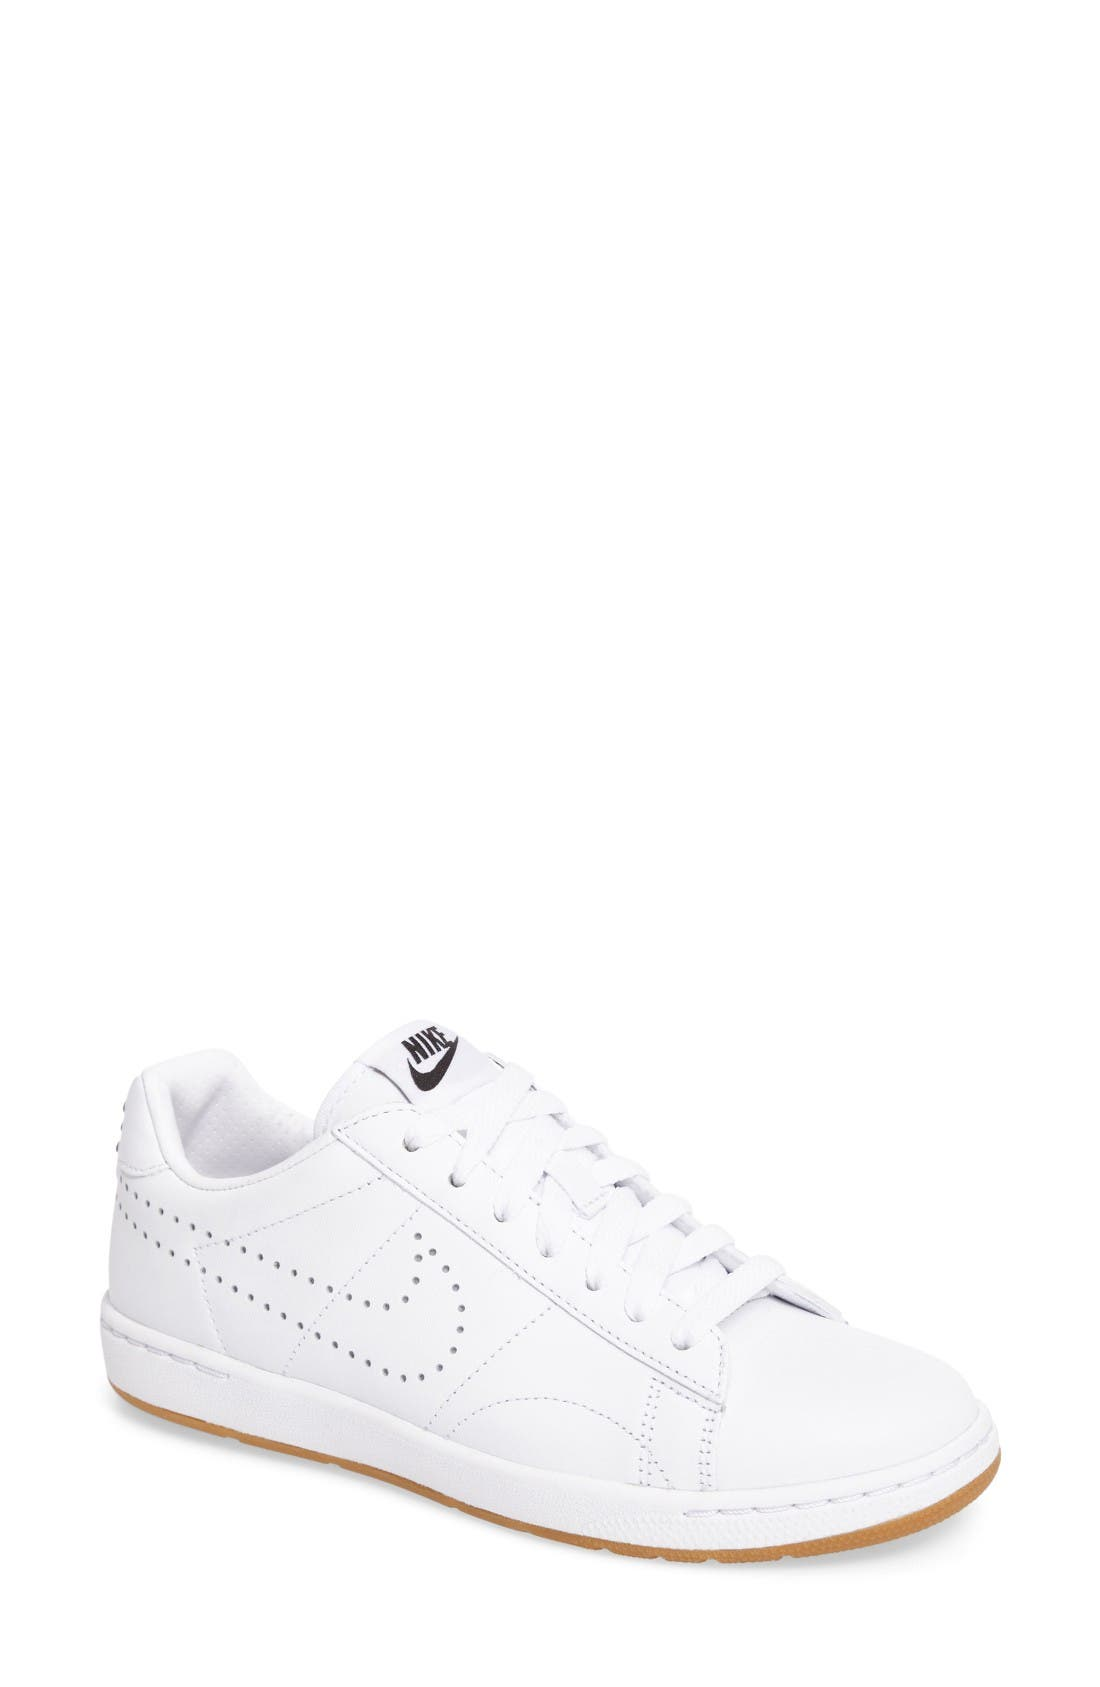 Nike 'Classic Ultra' Leather Sneaker (Women)